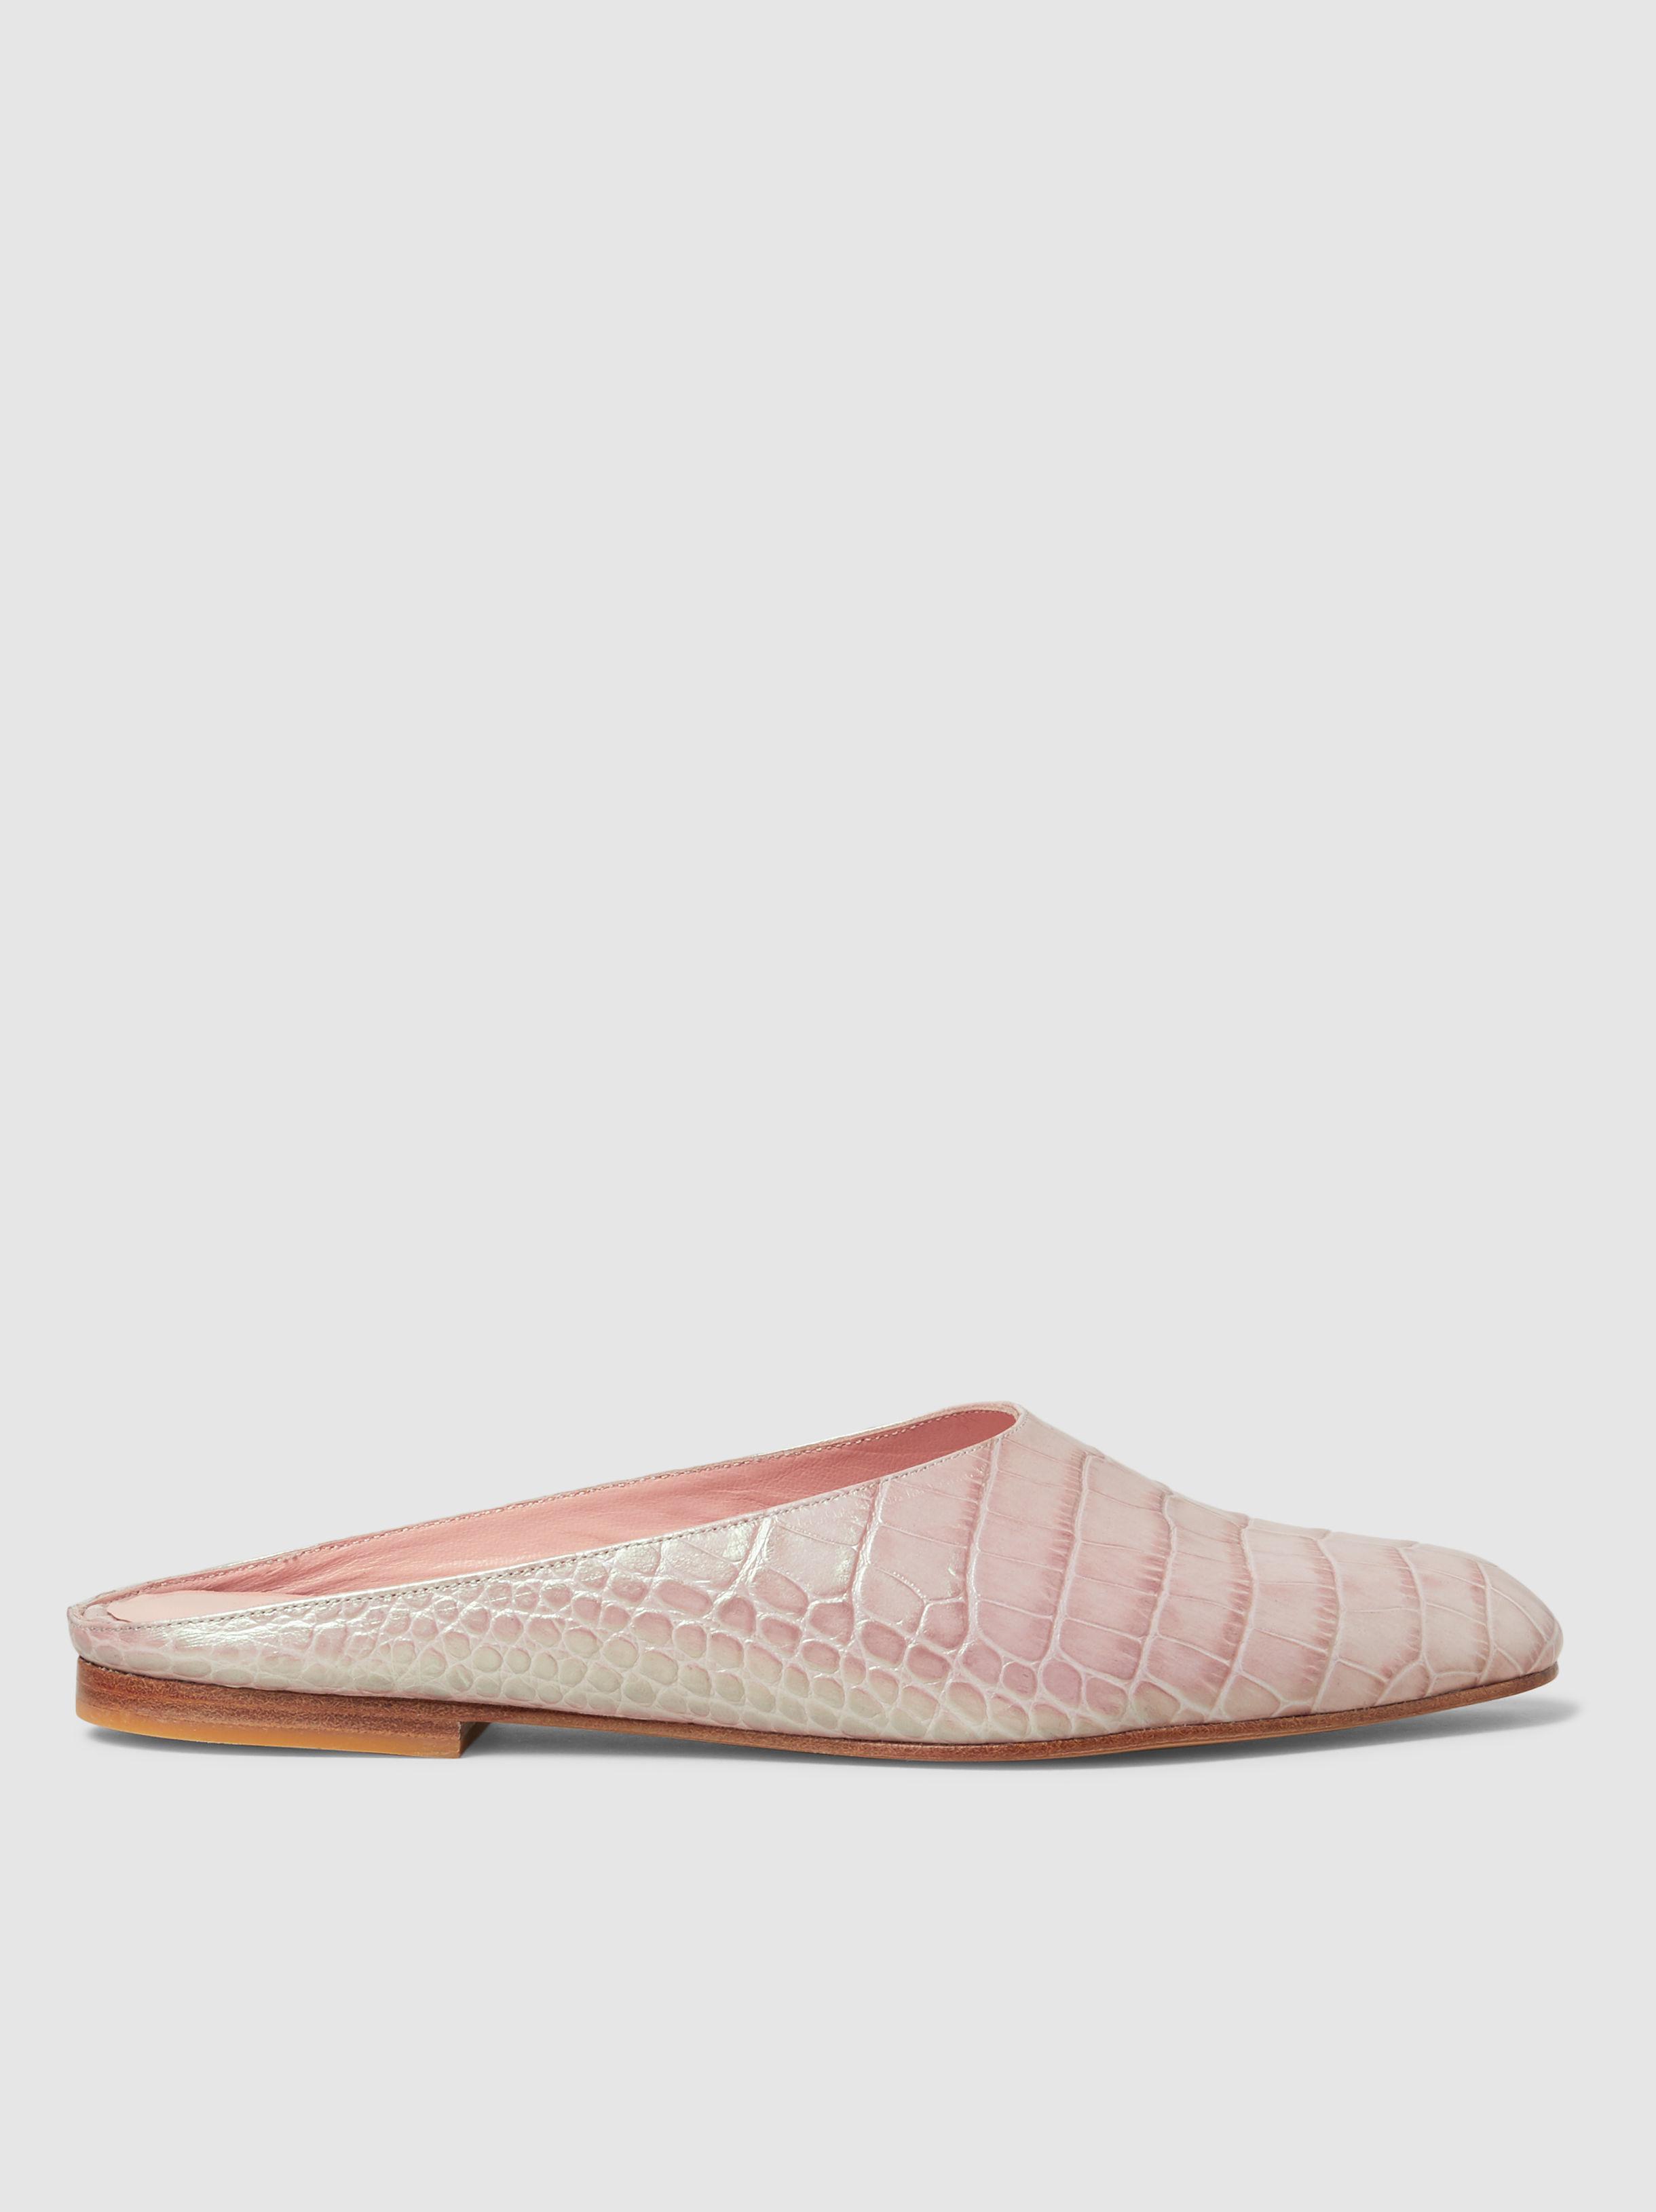 Leather Slippers Maryam Nassir Zadeh BiV3Zk